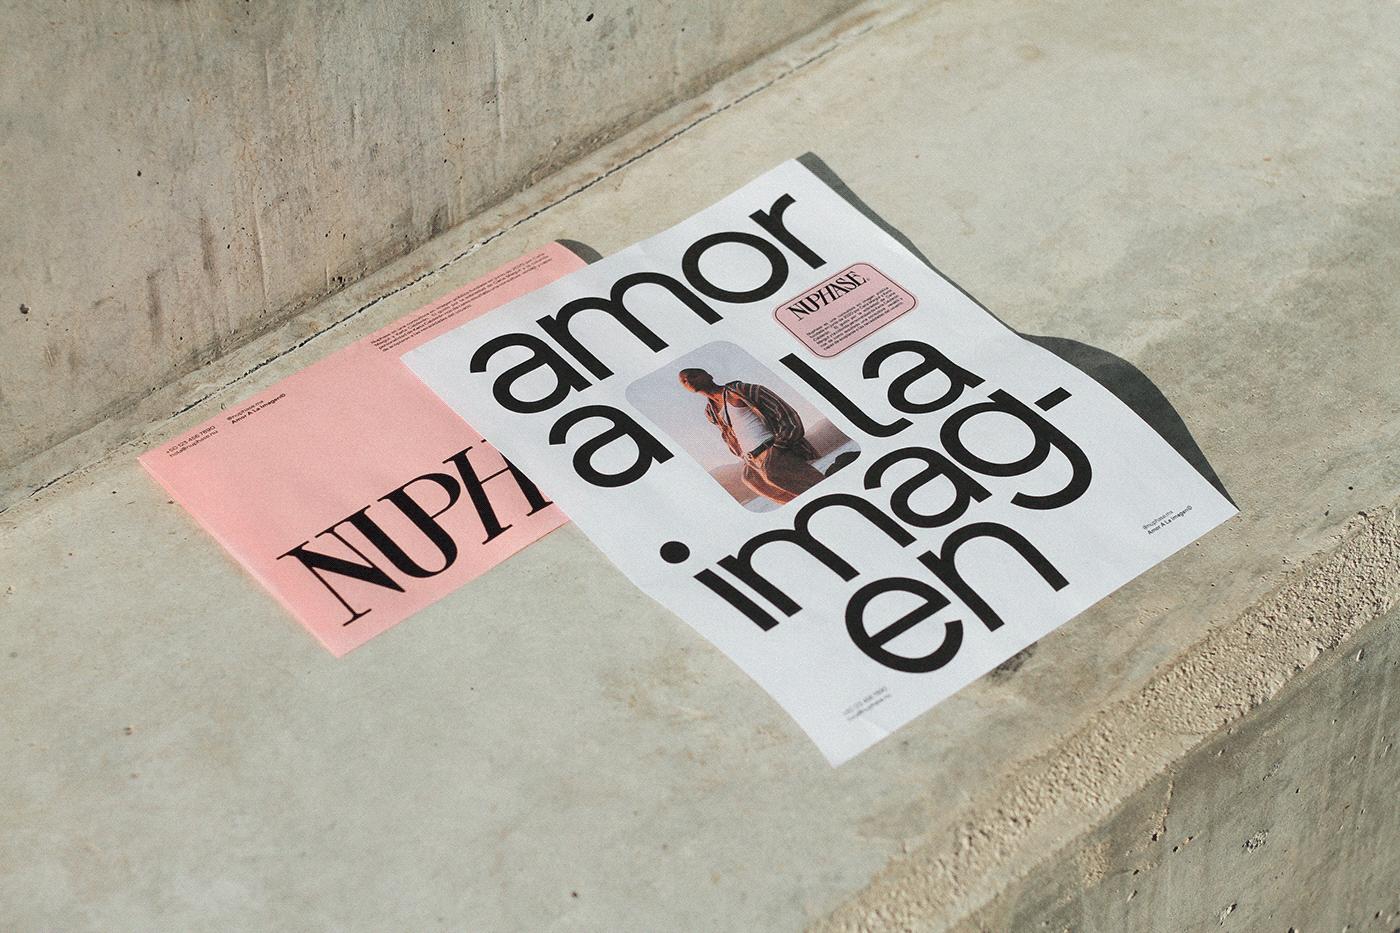 amor consultancy Consultora editorial Fashion  image consultant imagen mexico print Queretaro